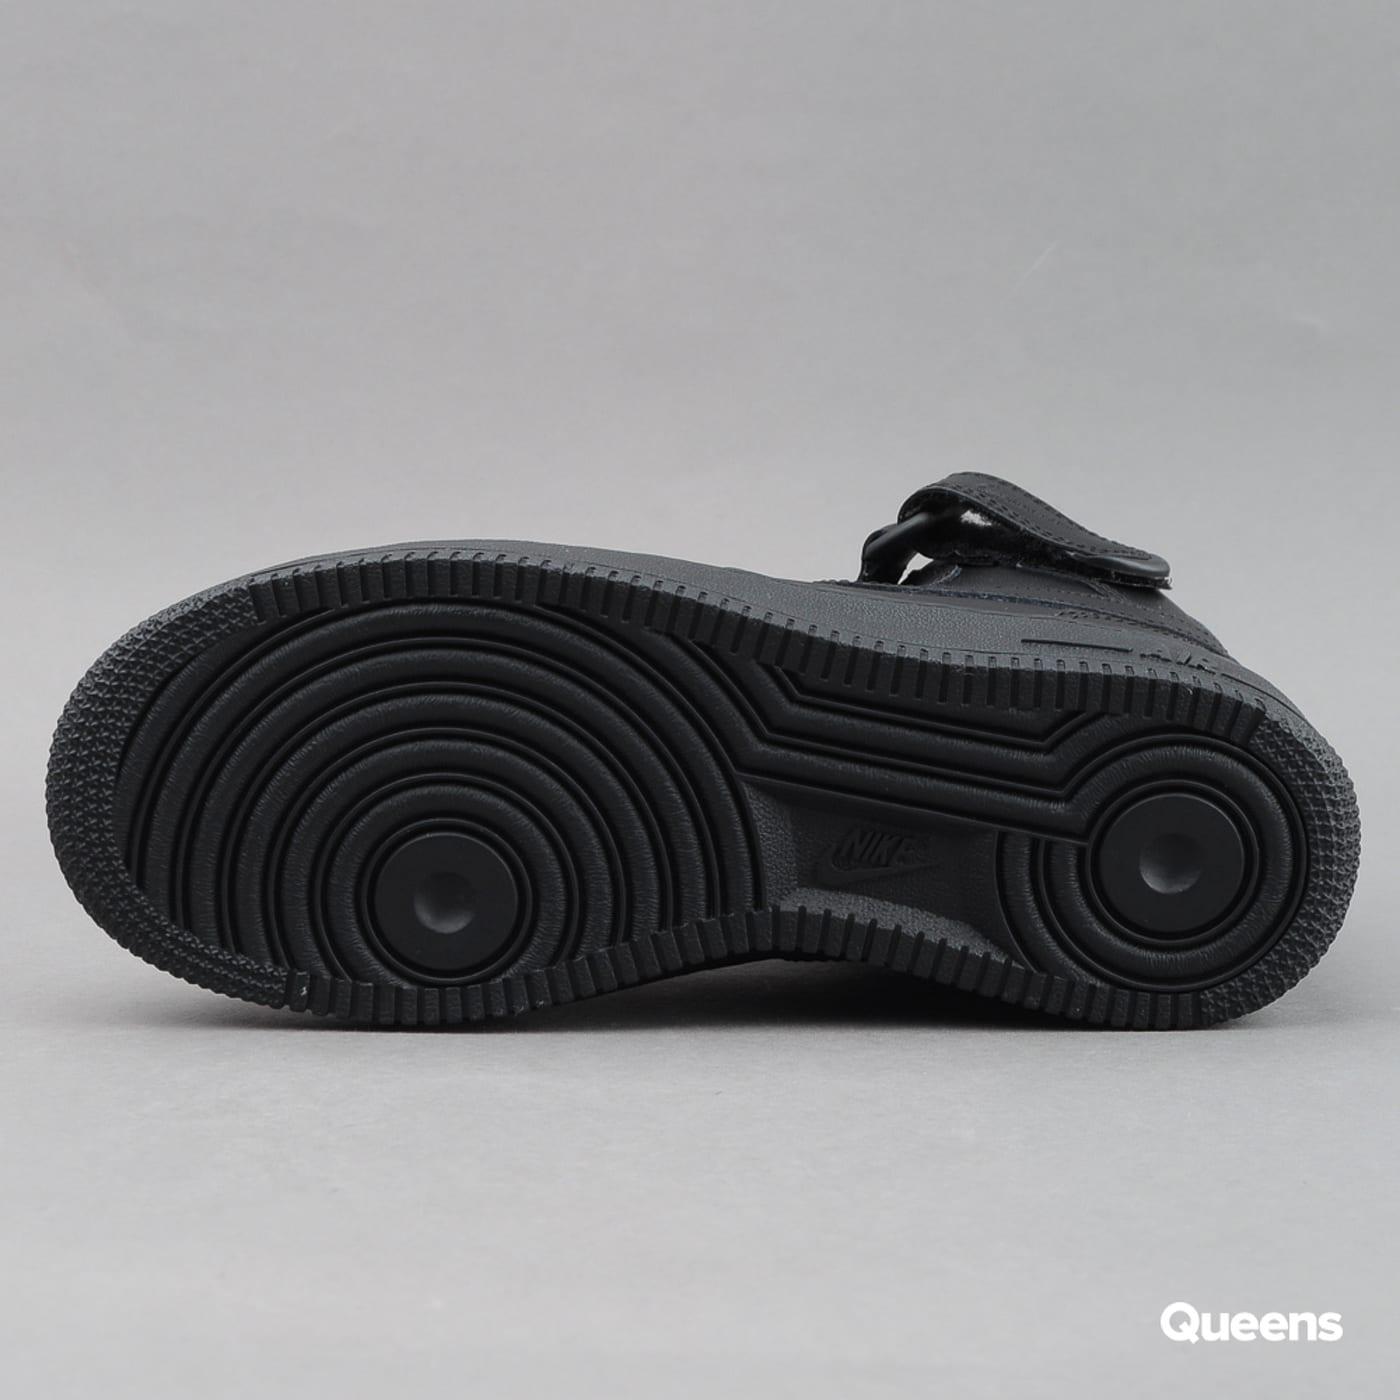 Nike WMNS Air Force 1 Mid '07 LE black / black